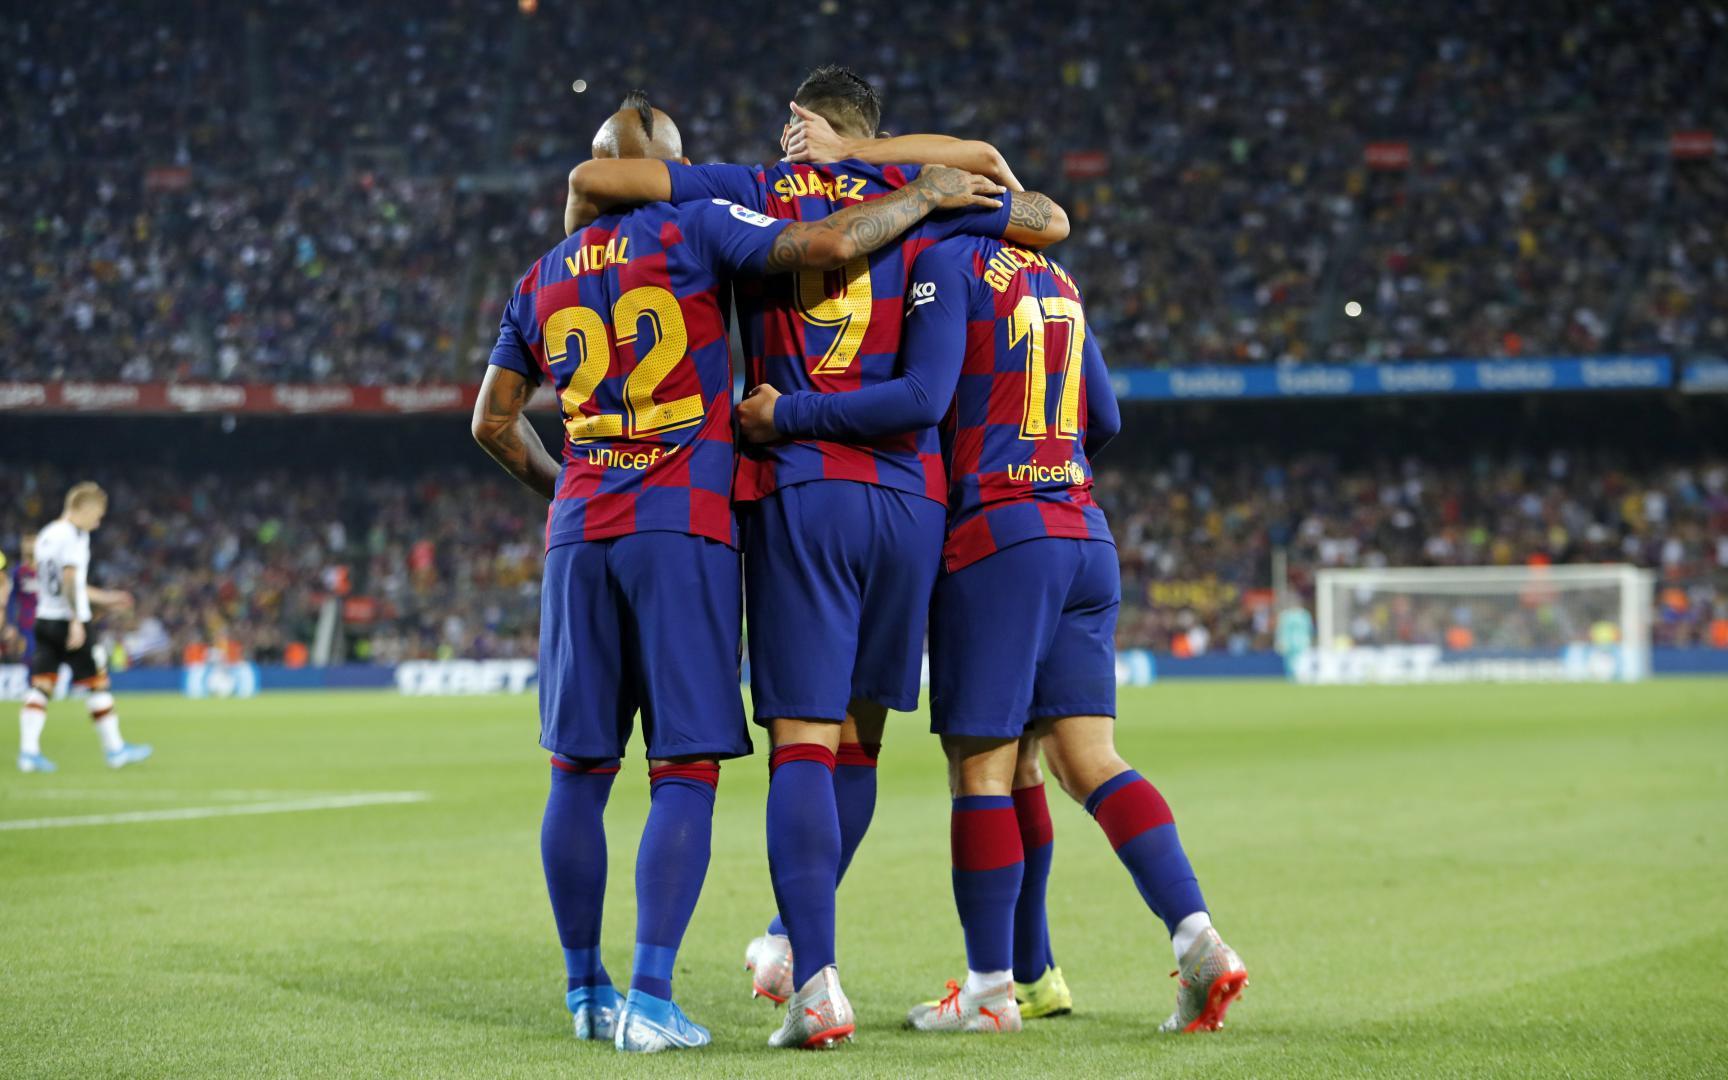 PREVIEW: FC Barcelona vs Villarreal